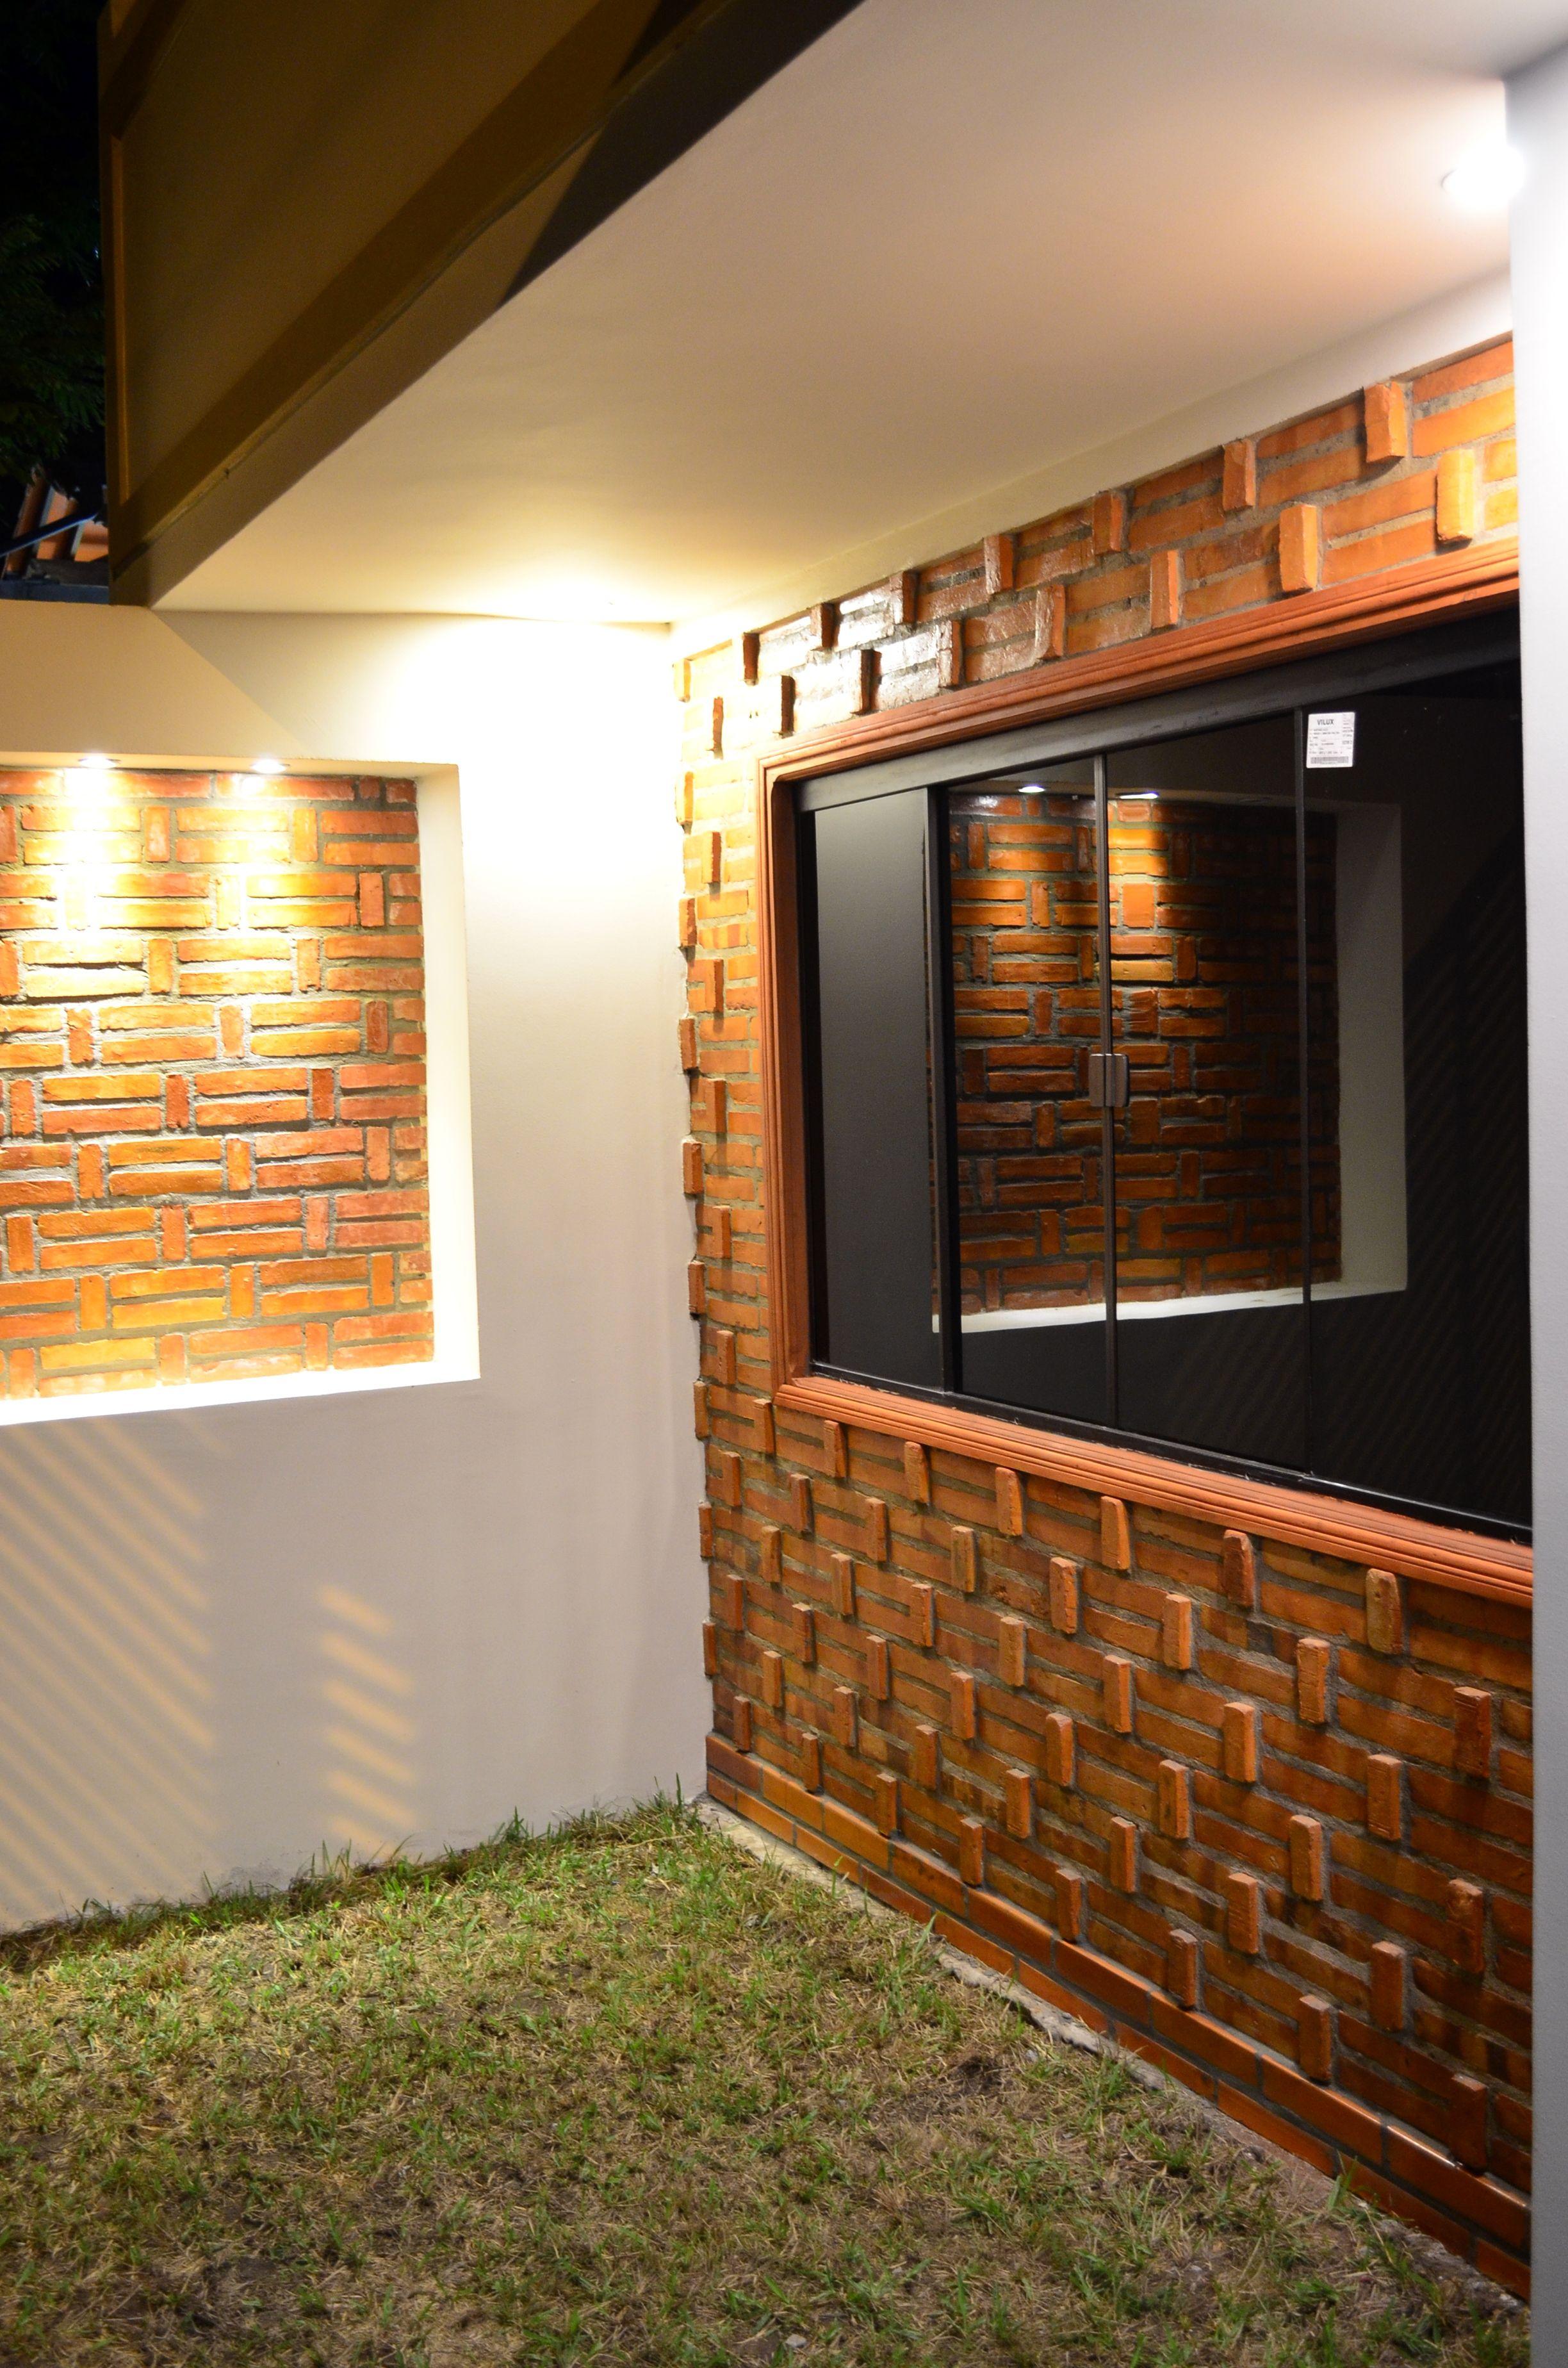 diseo de paredes de ladrillo visto iluminacin led en la fahcada principal